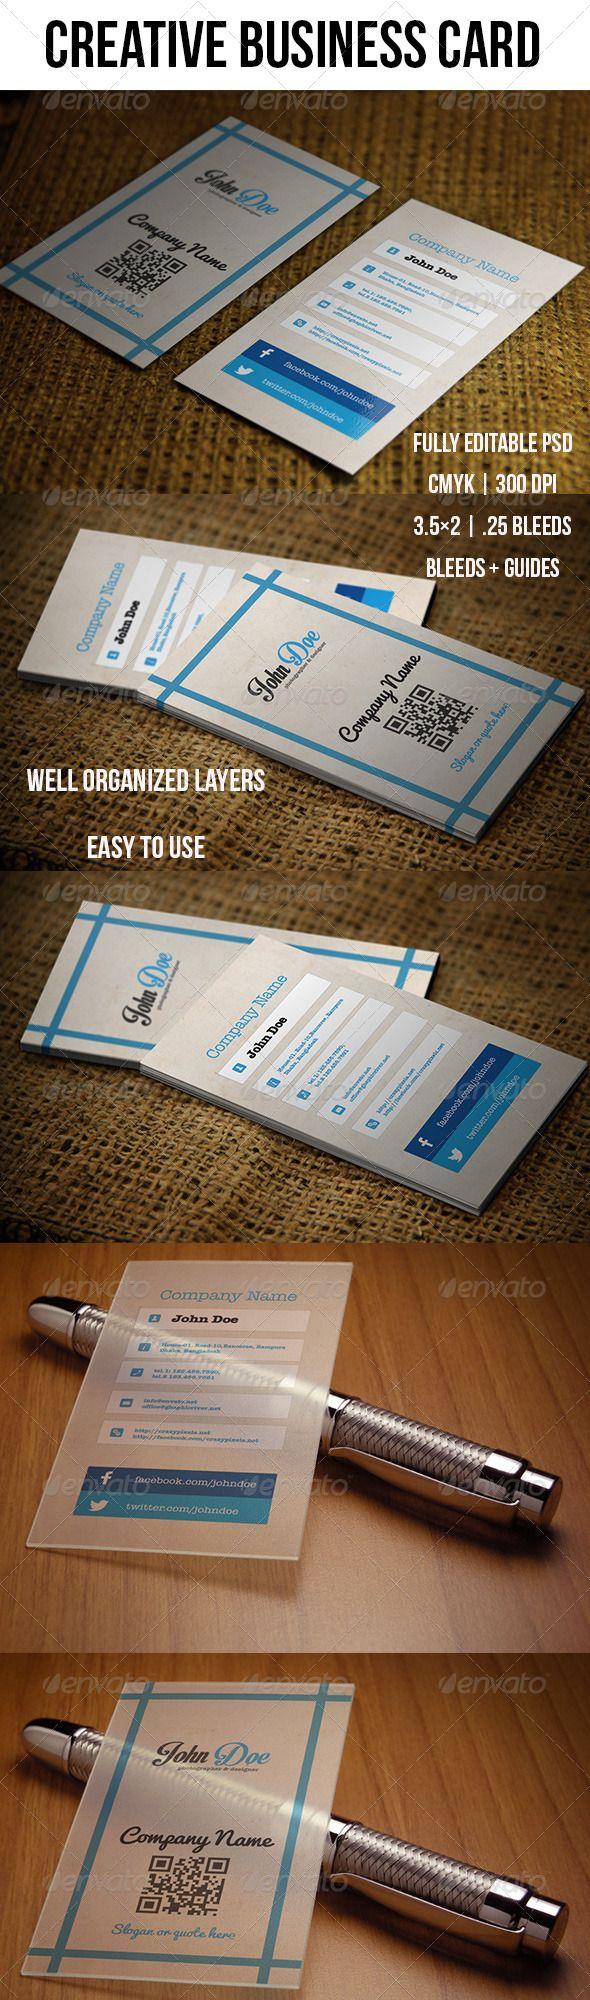 92 best print templates images on pinterest printables script creative business card magicingreecefo Choice Image